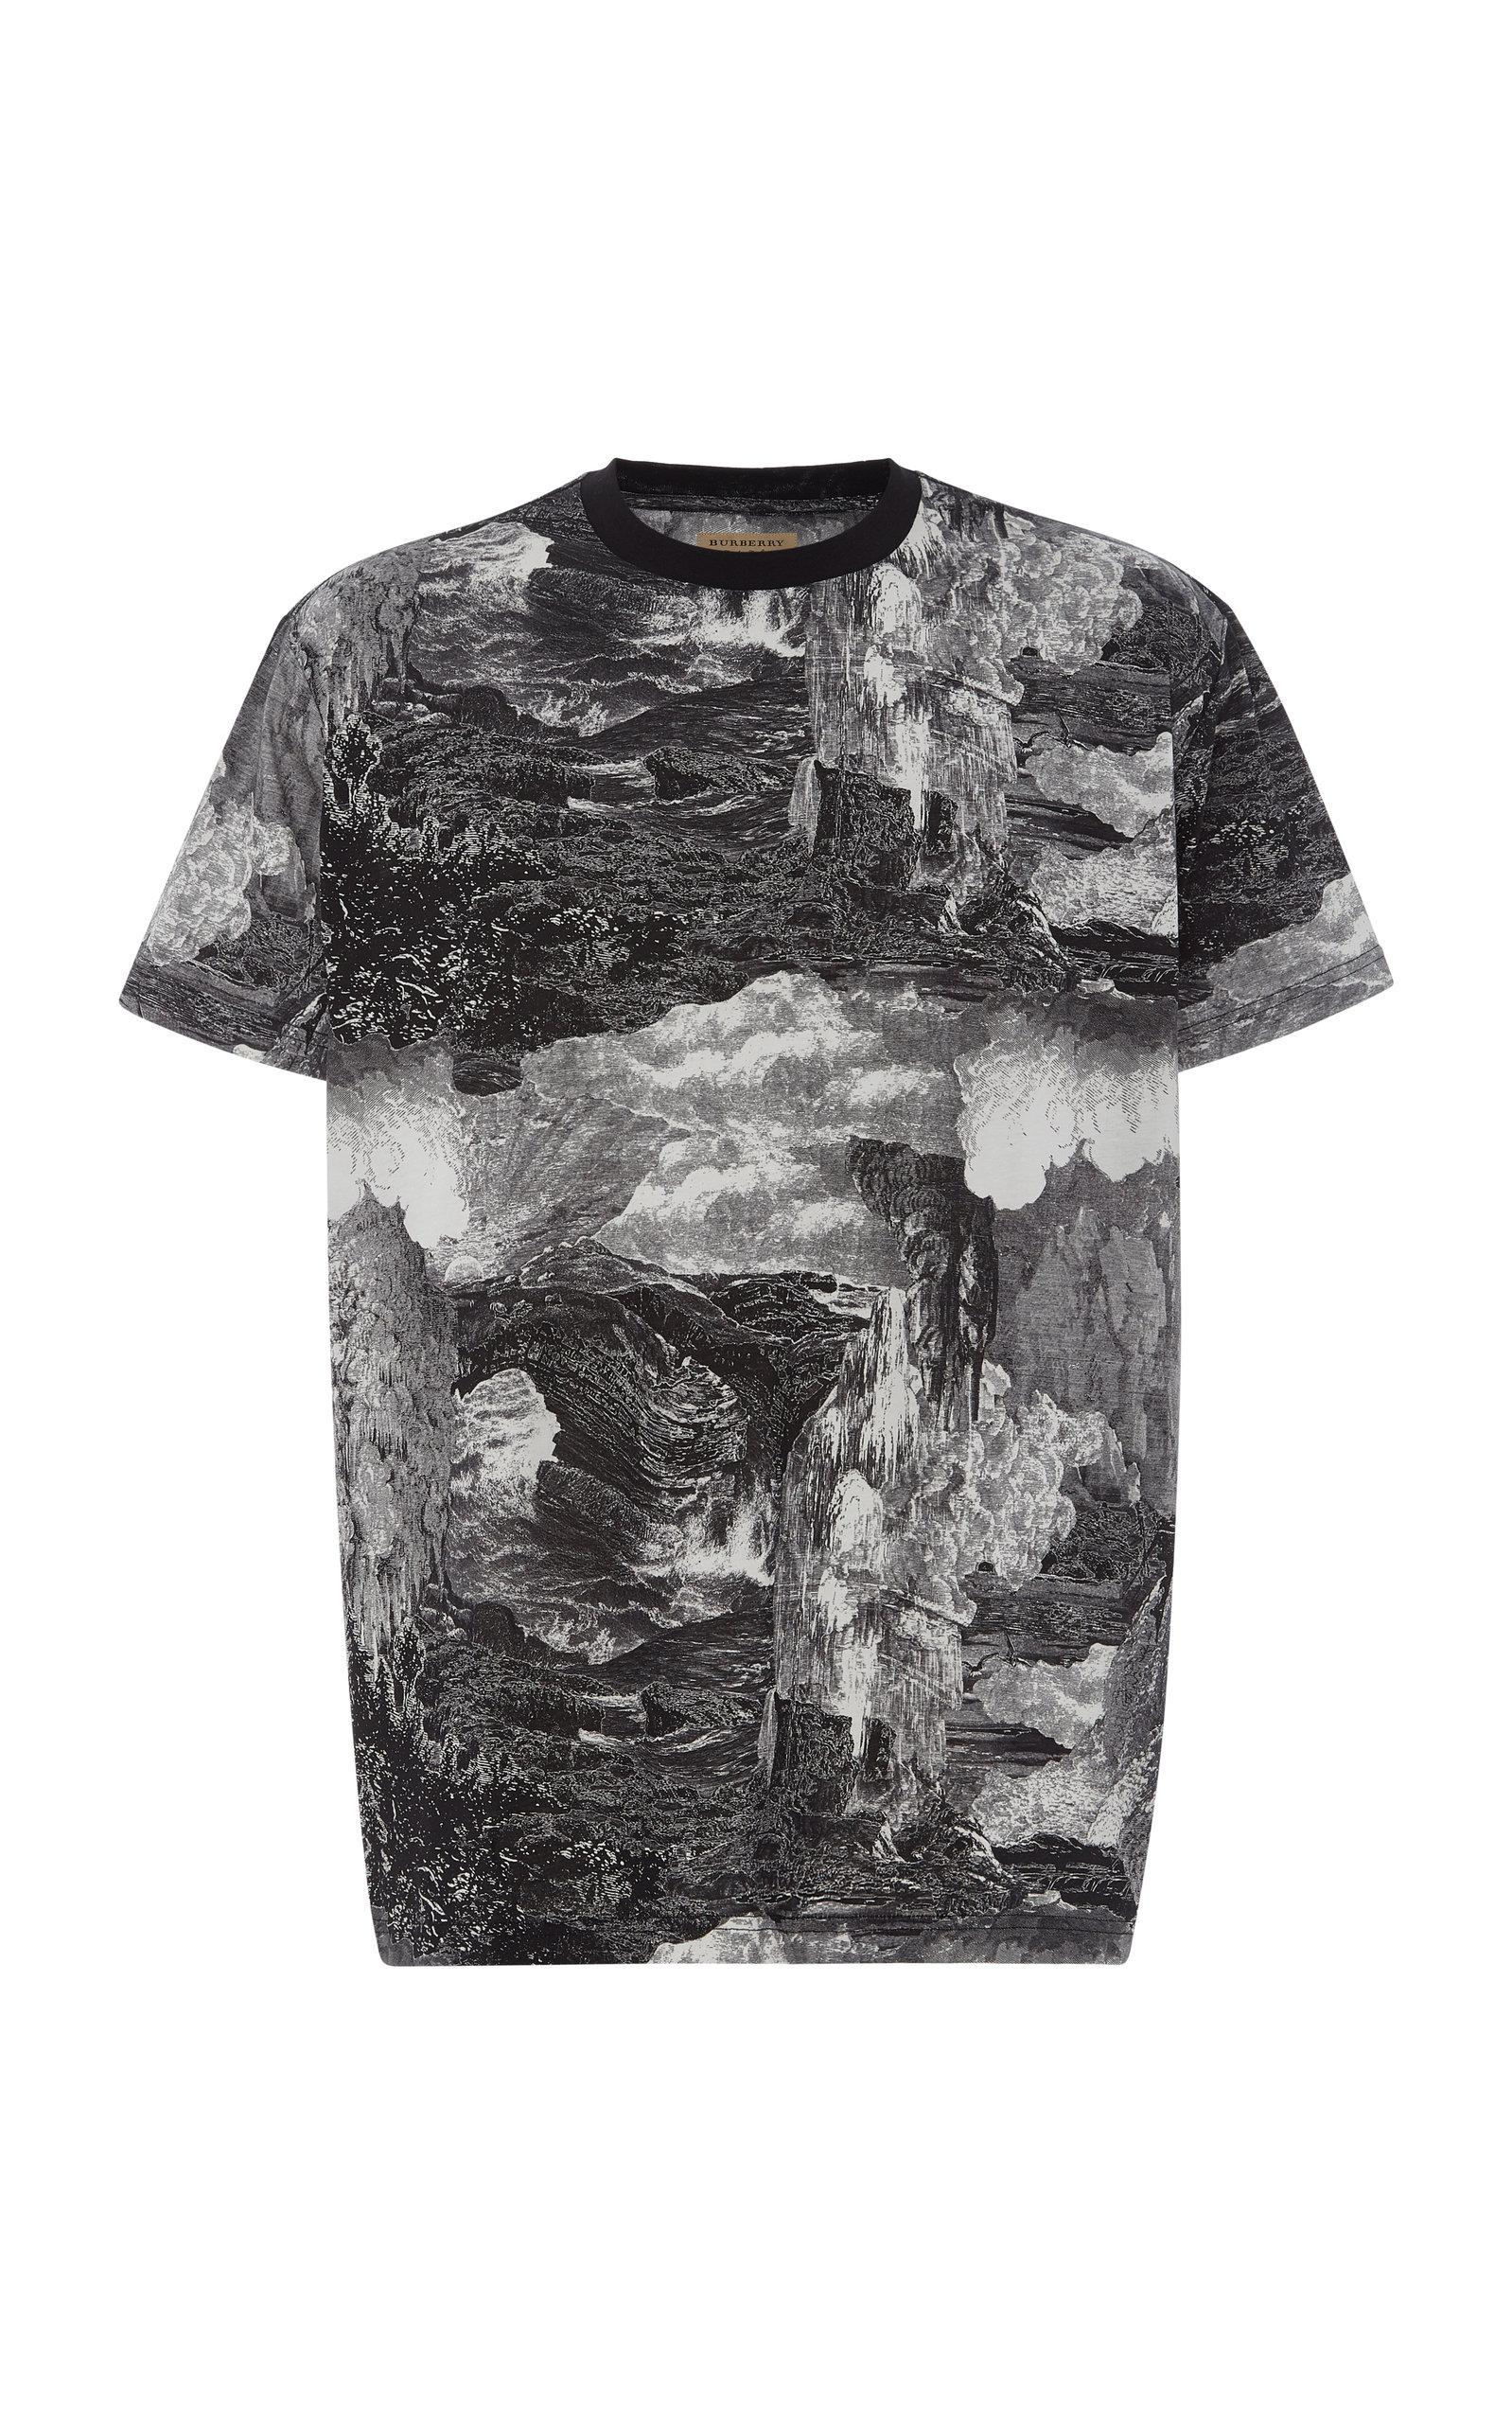 8a41580a1 Printed Cotton-Jersey T-Shirt by Burberry | Moda Operandi